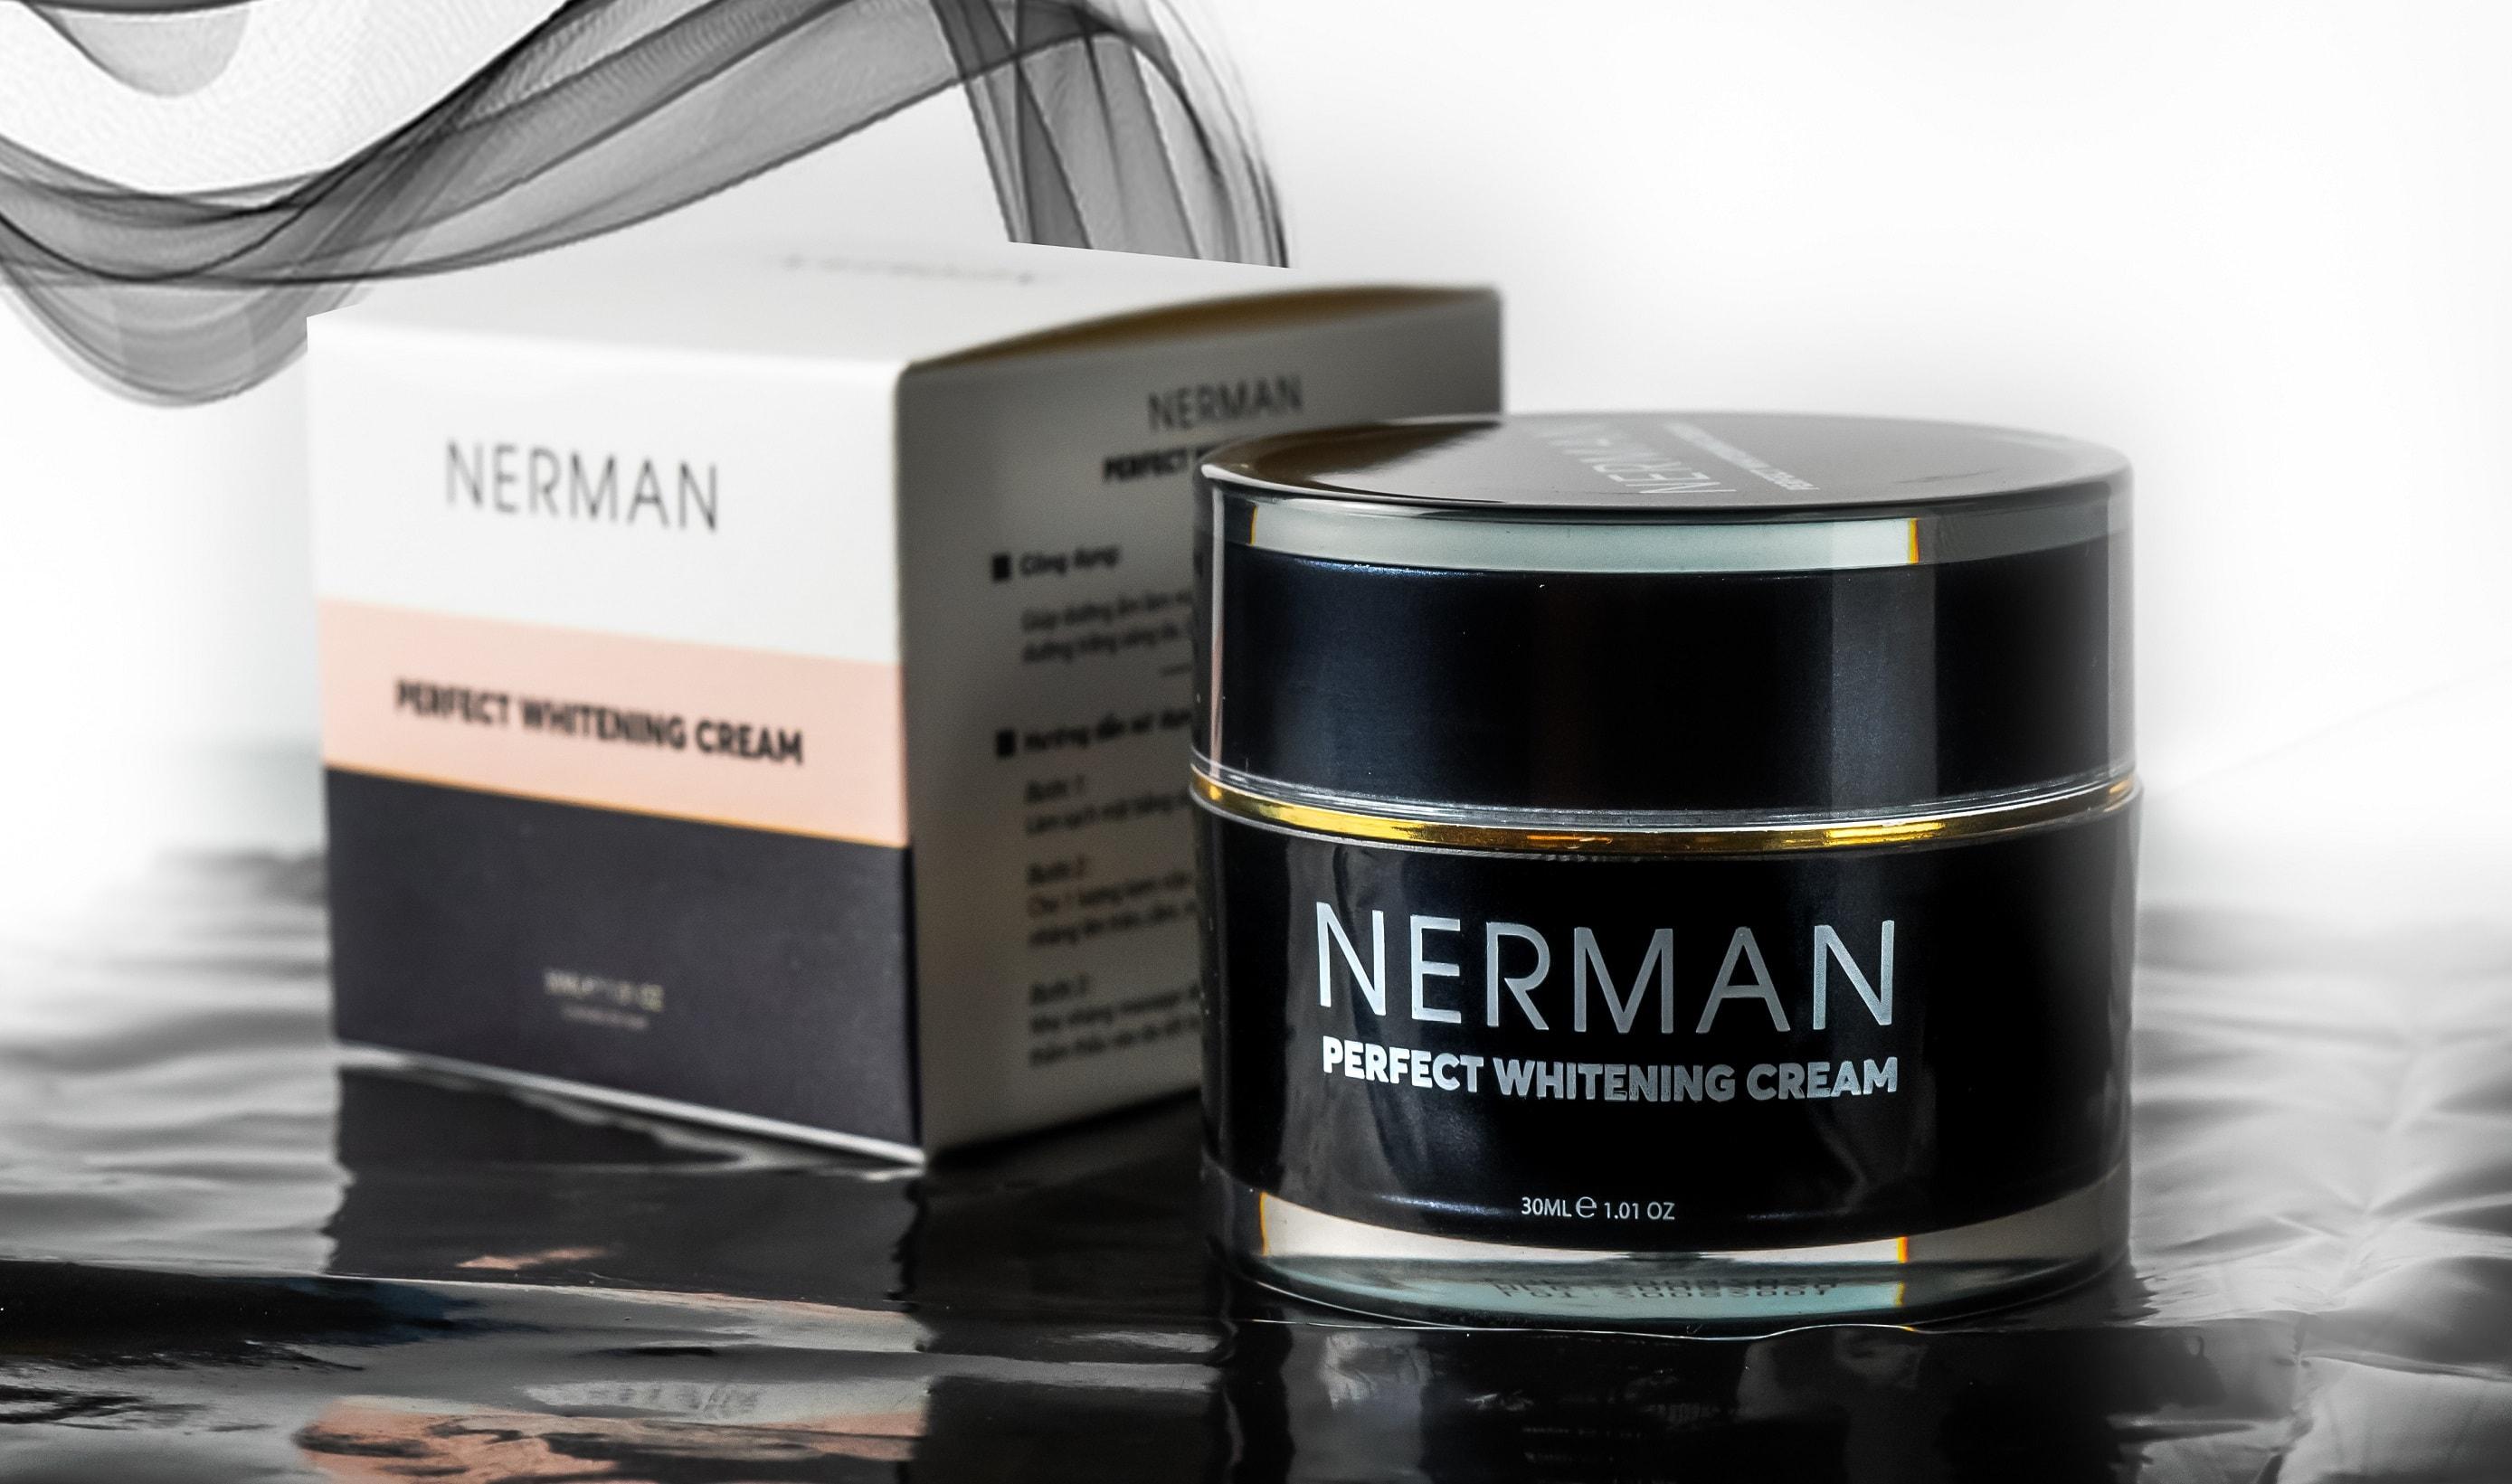 Kem trắng da mờ sẹo Nerman Perfect Whitening Cream